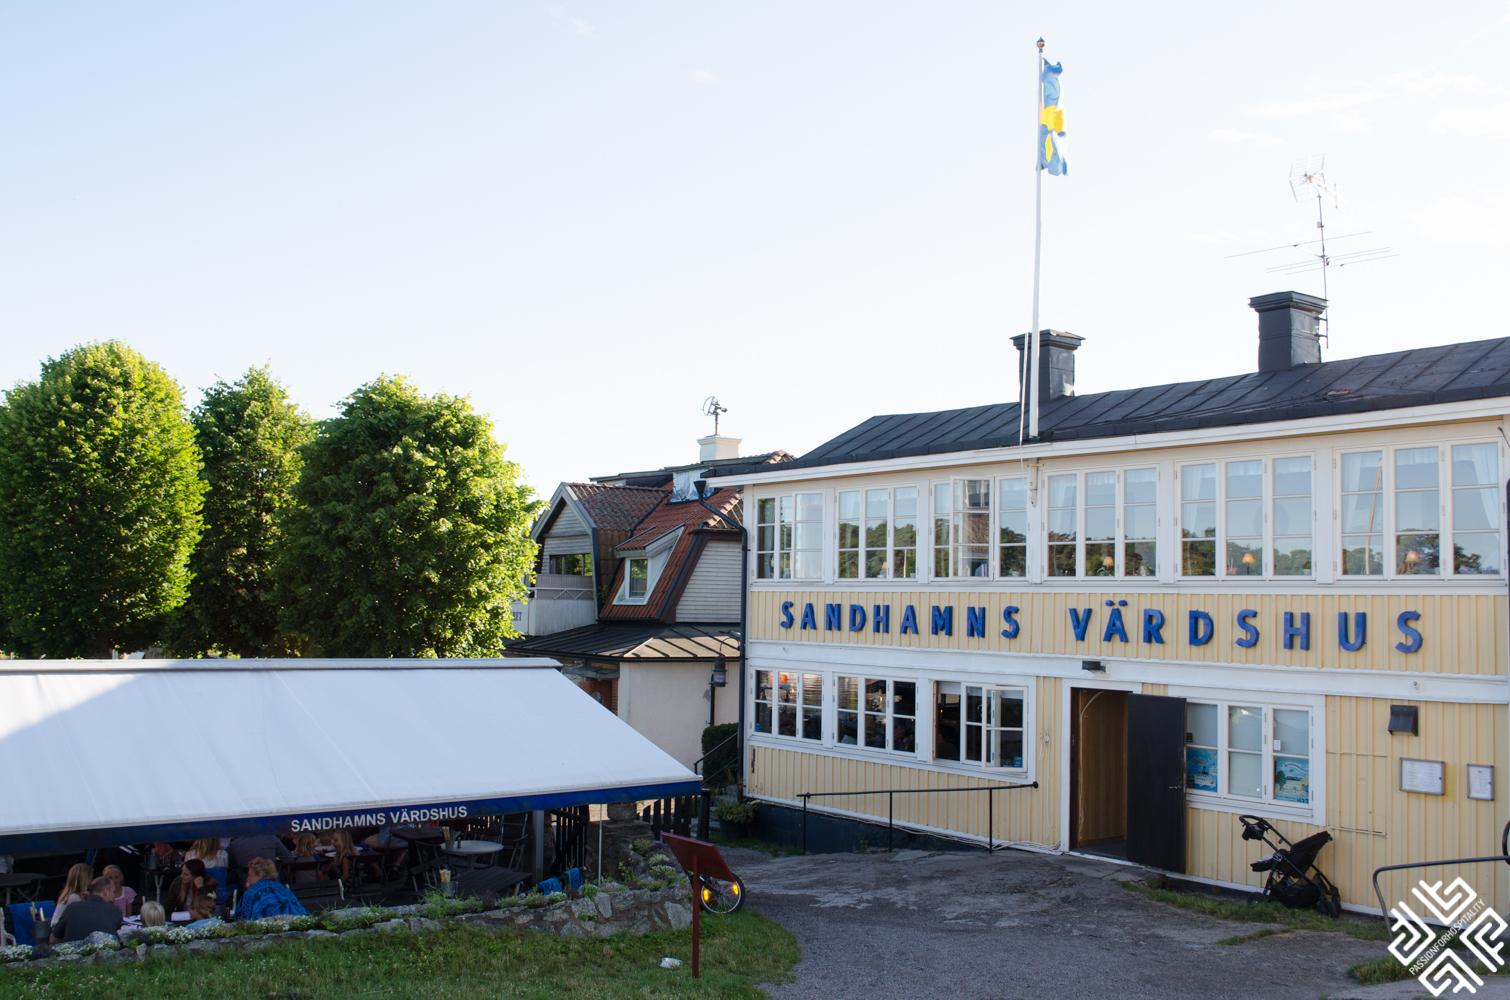 stockholm_sandhamn-1